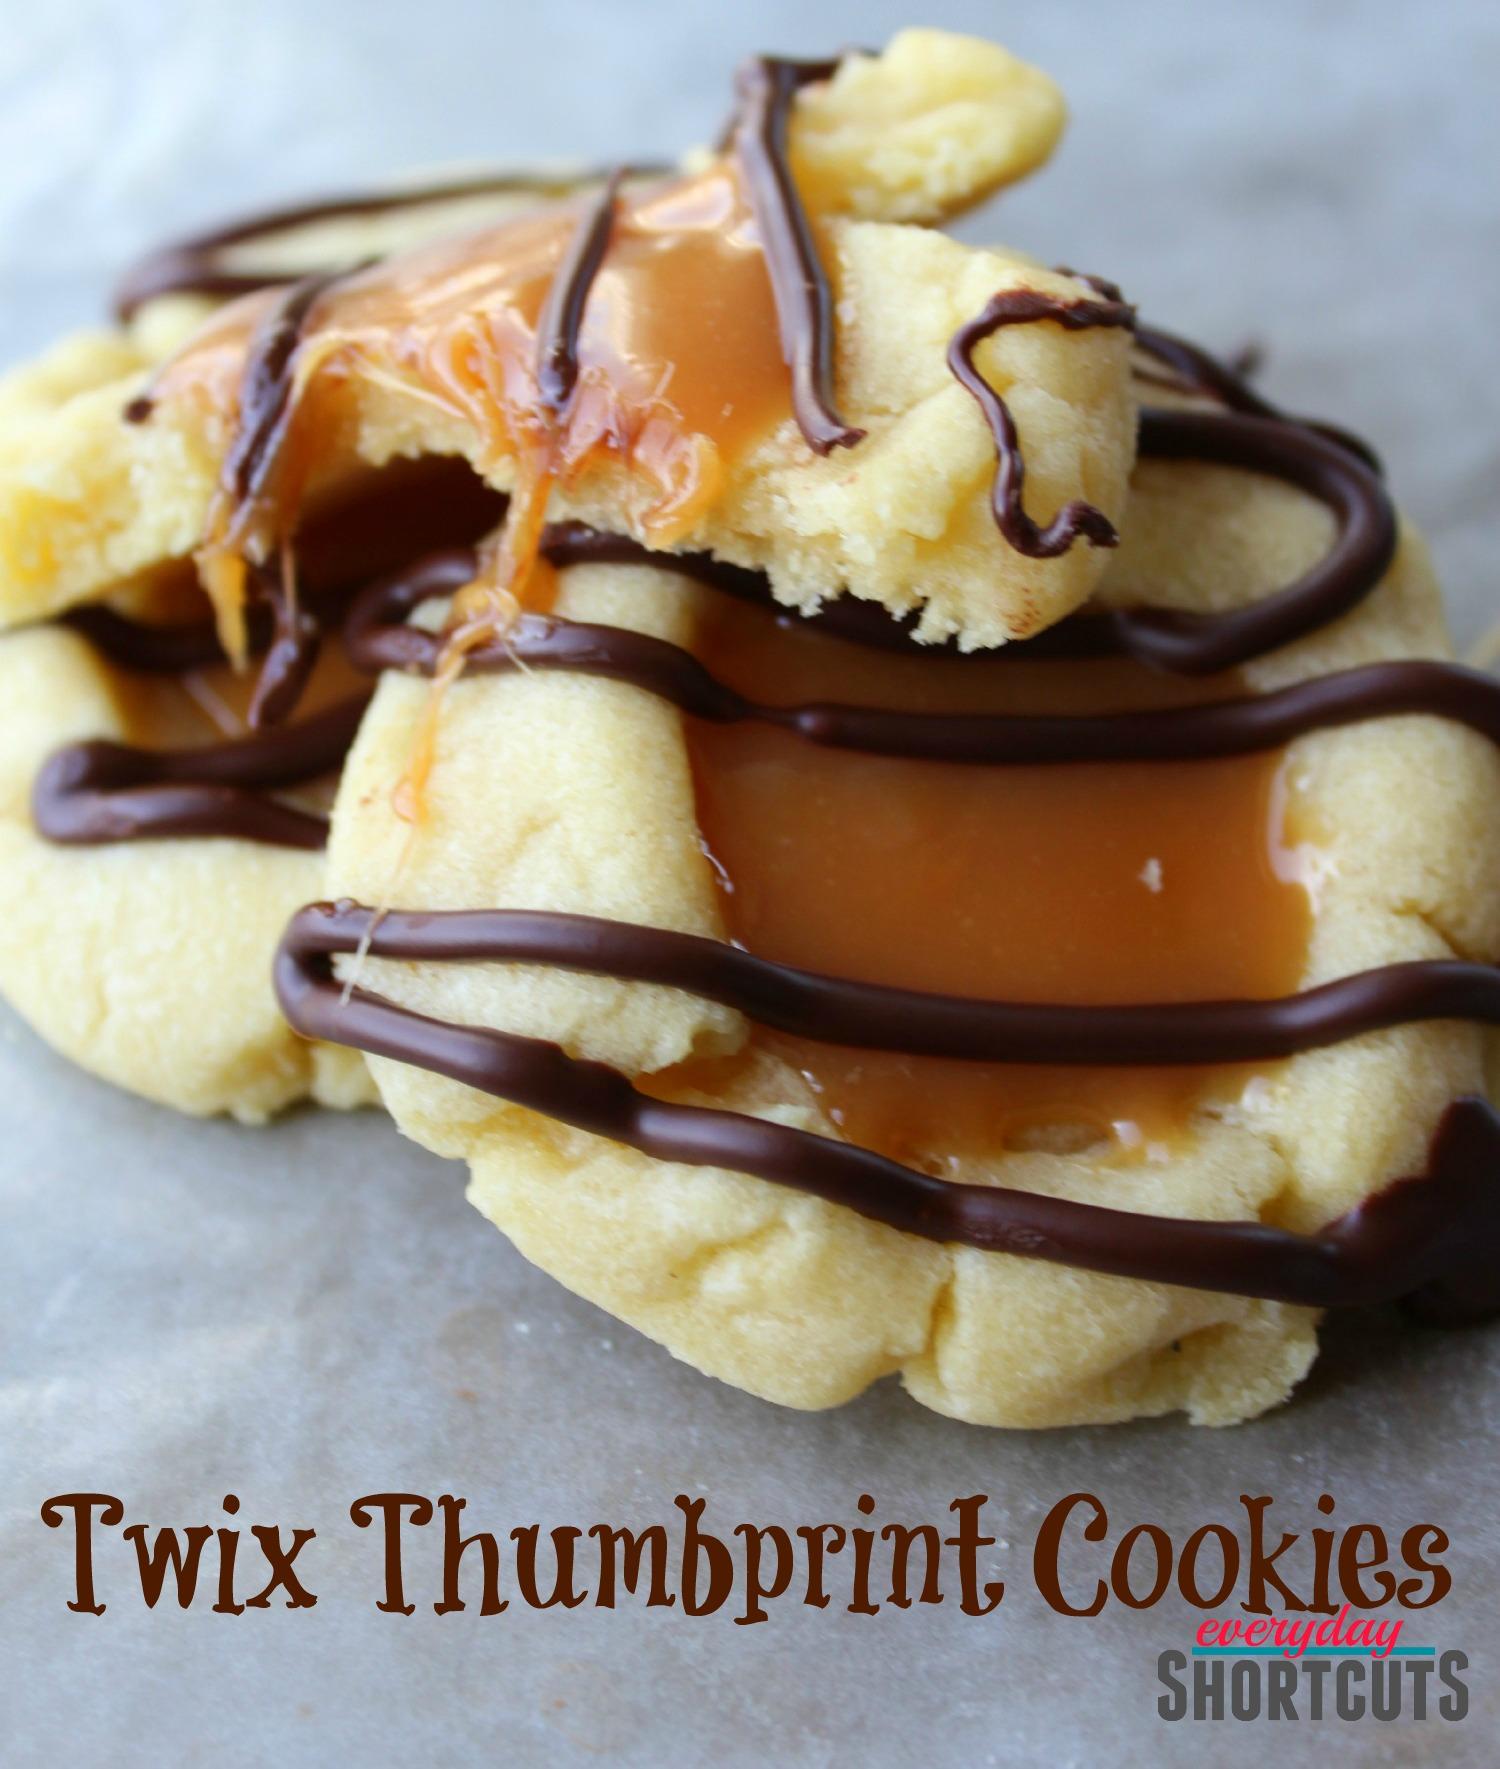 twix thumbprint cookies